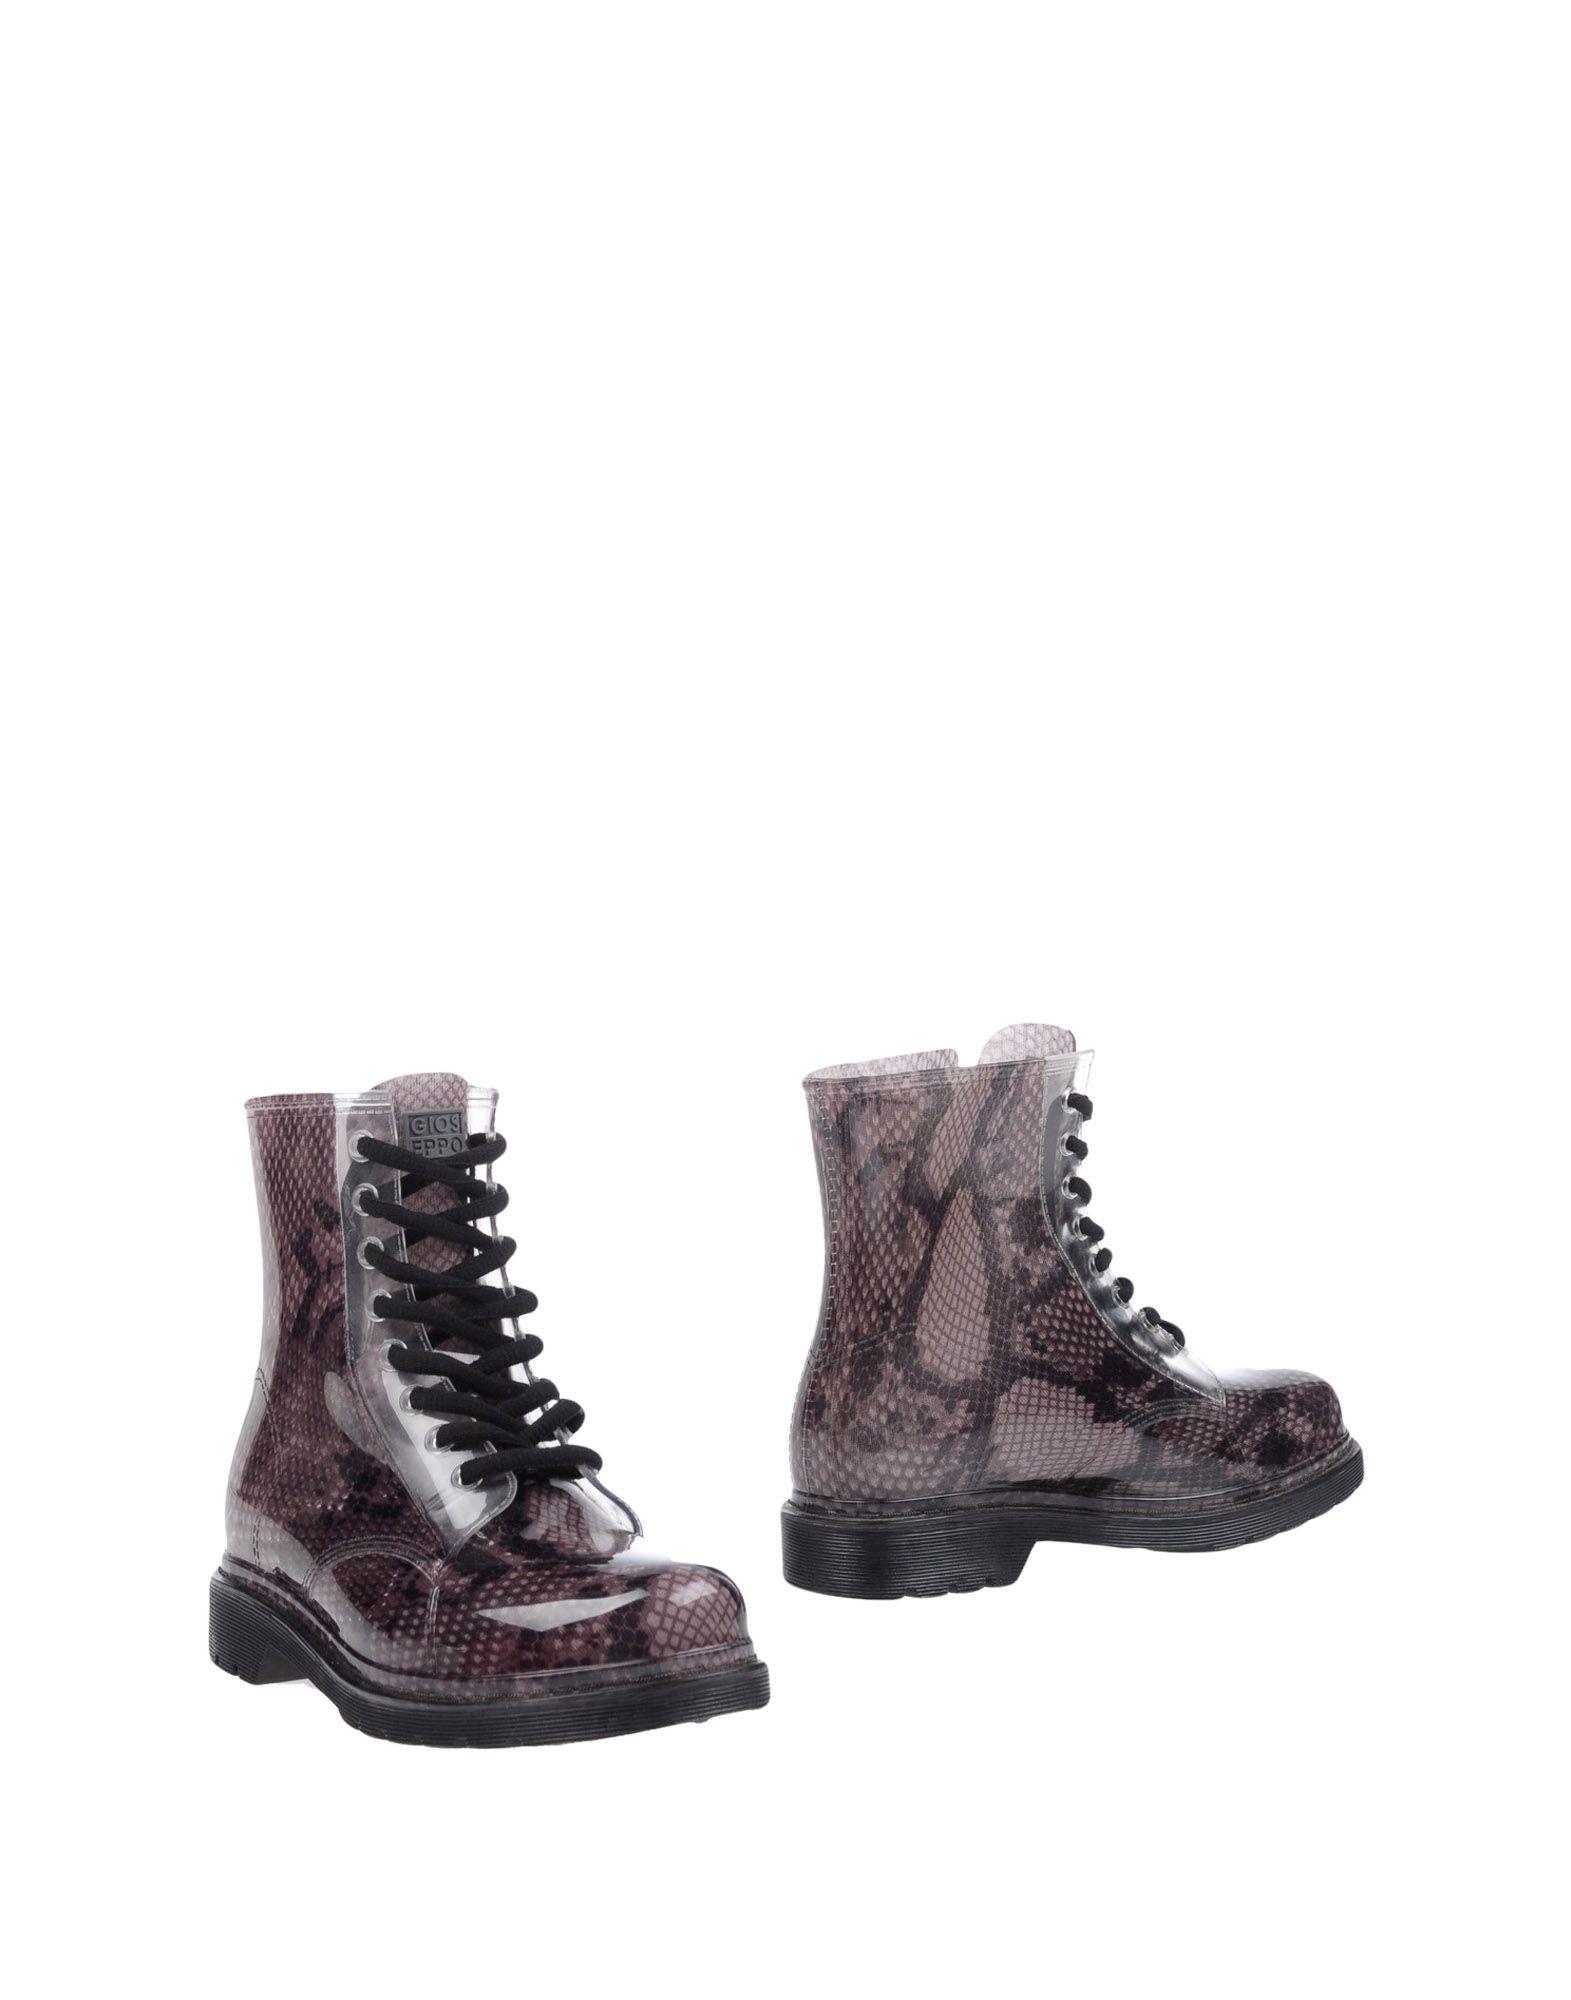 GIOSEPPO Полусапоги и высокие ботинки george j love полусапоги и высокие ботинки